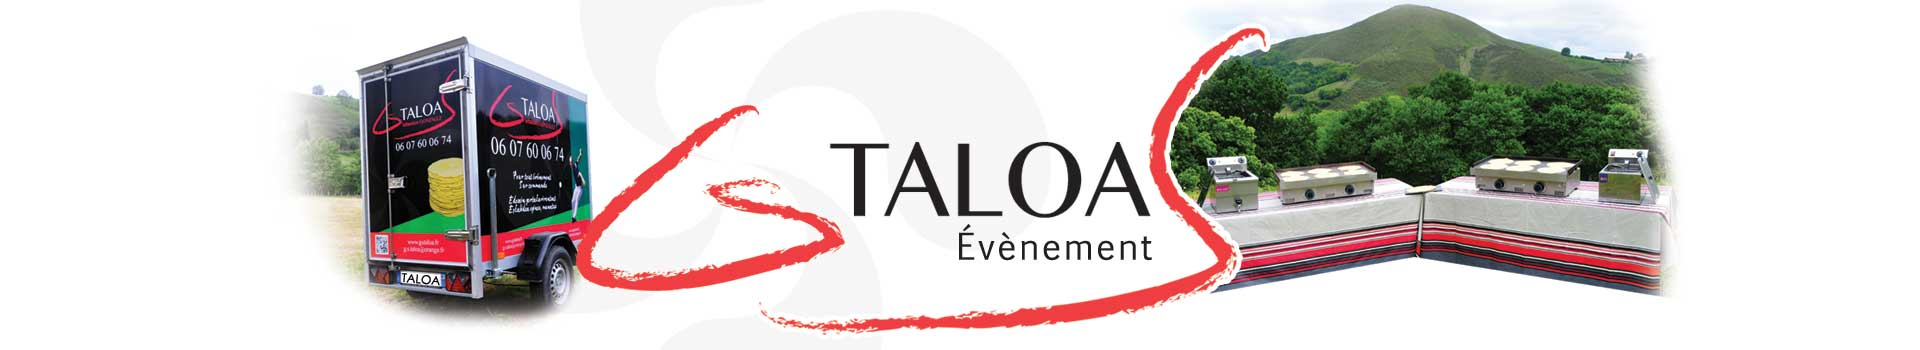 gs-taloa-accompagne-evenement-slide-petit